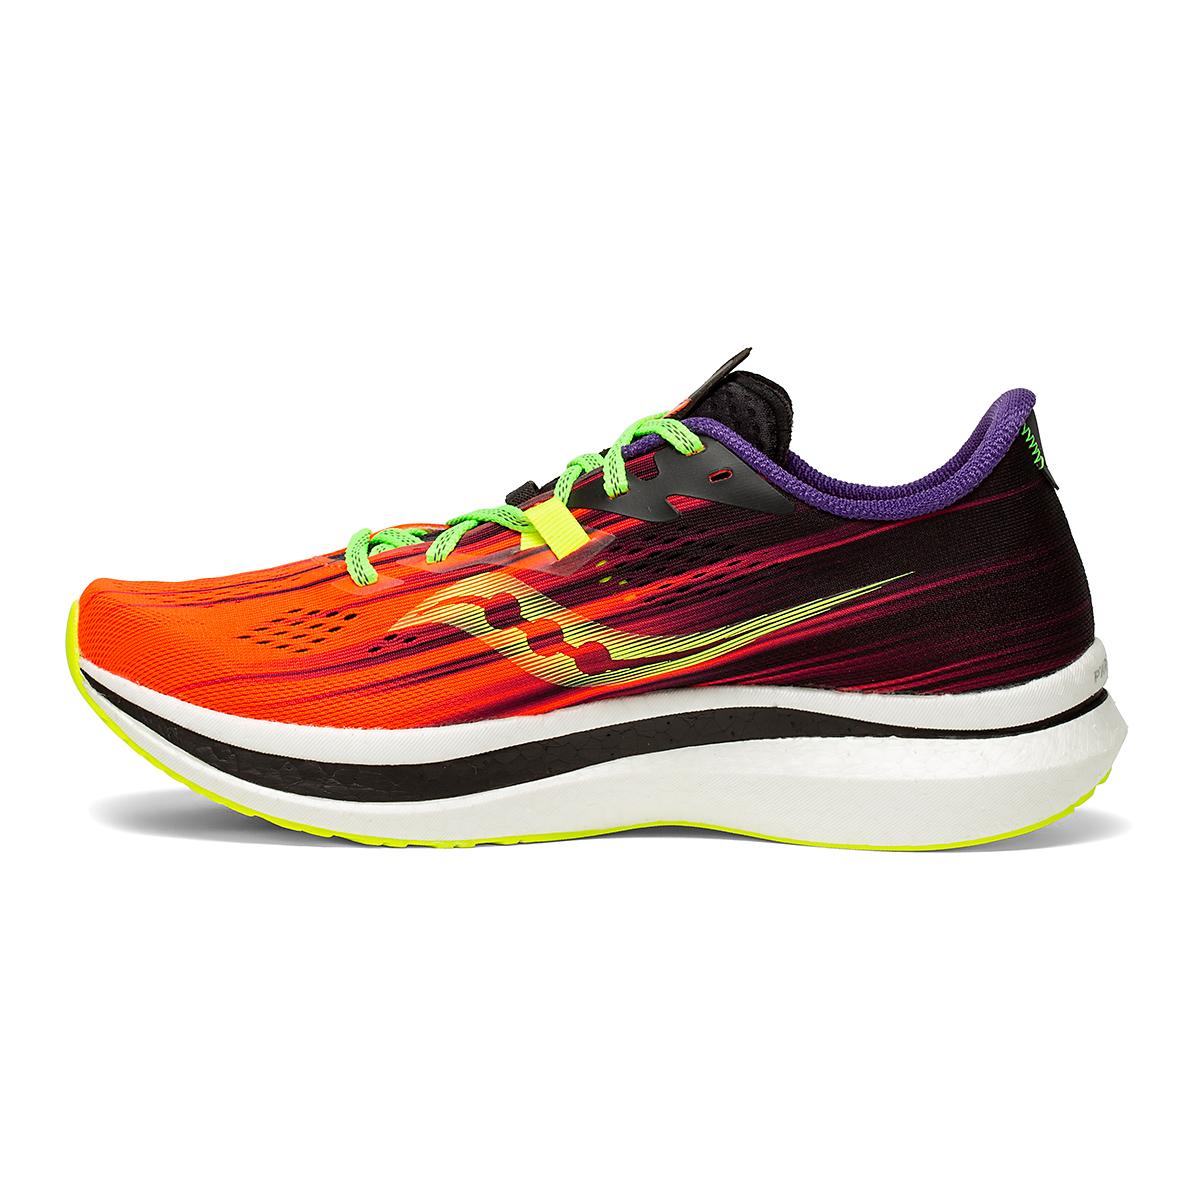 Men's Saucony Endorphin Pro 2 Running Shoe - Color: Vizipro - Size: 7 - Width: Regular, Vizipro, large, image 2